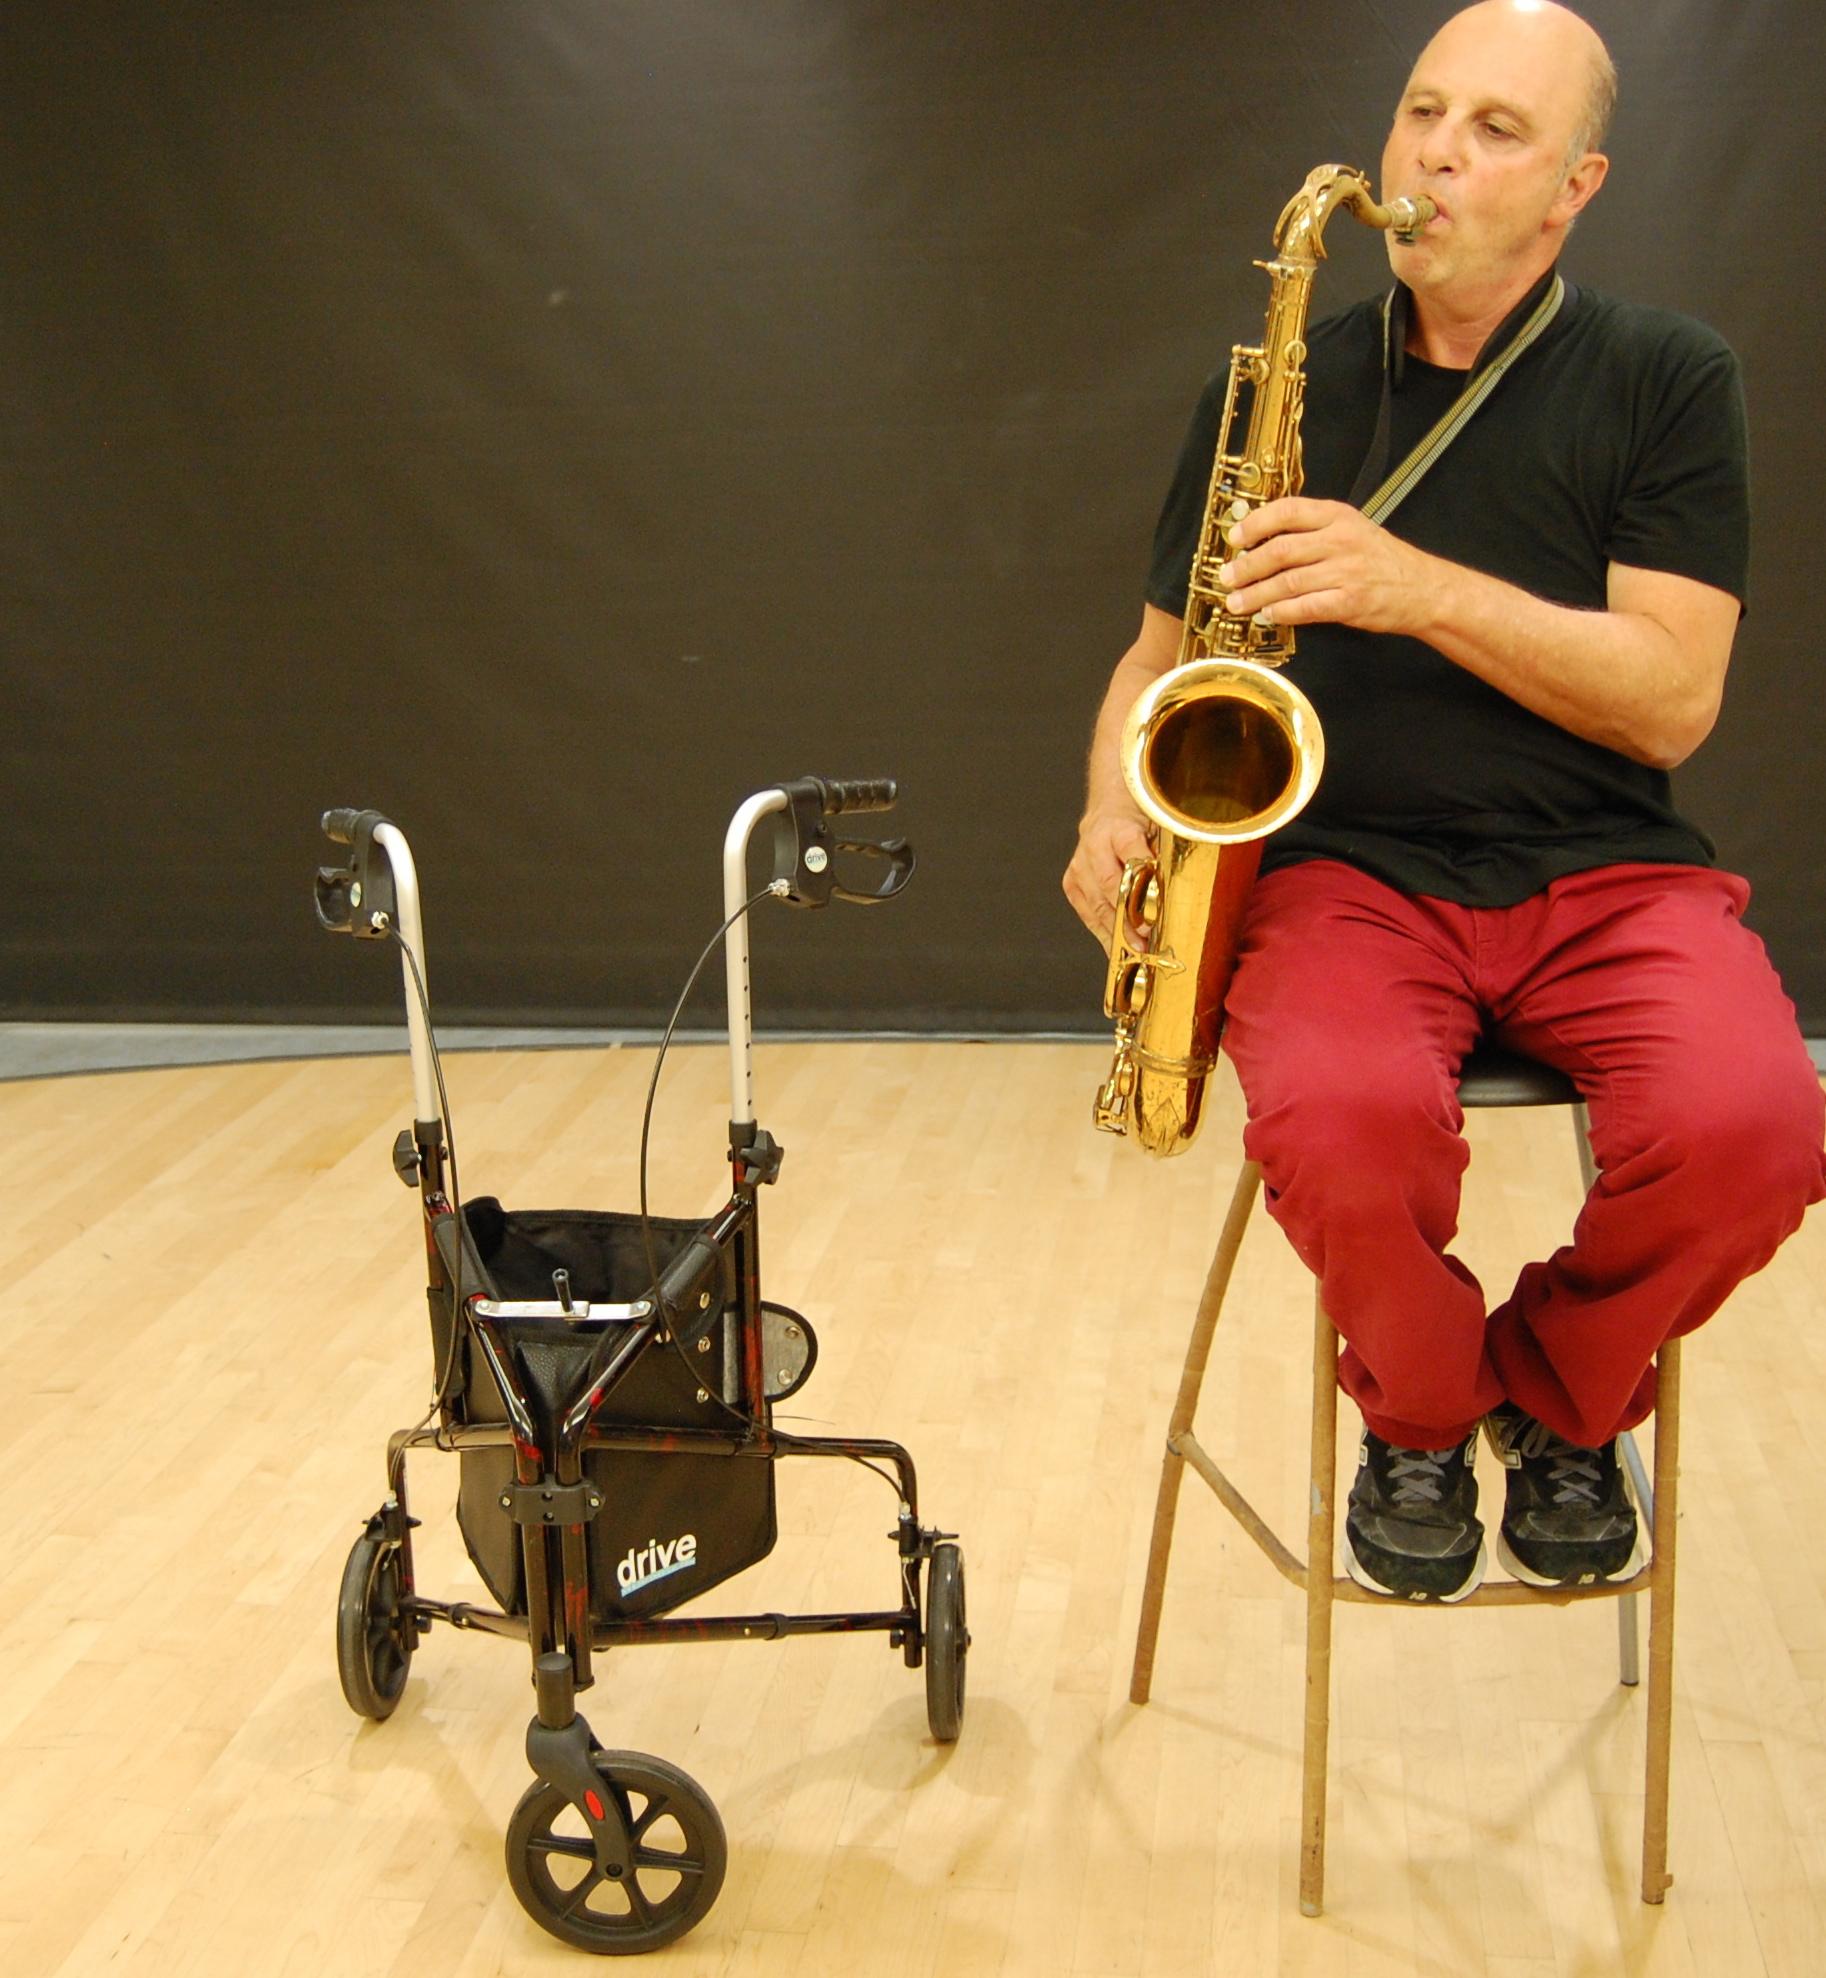 Jerry Finkelstein plays sax